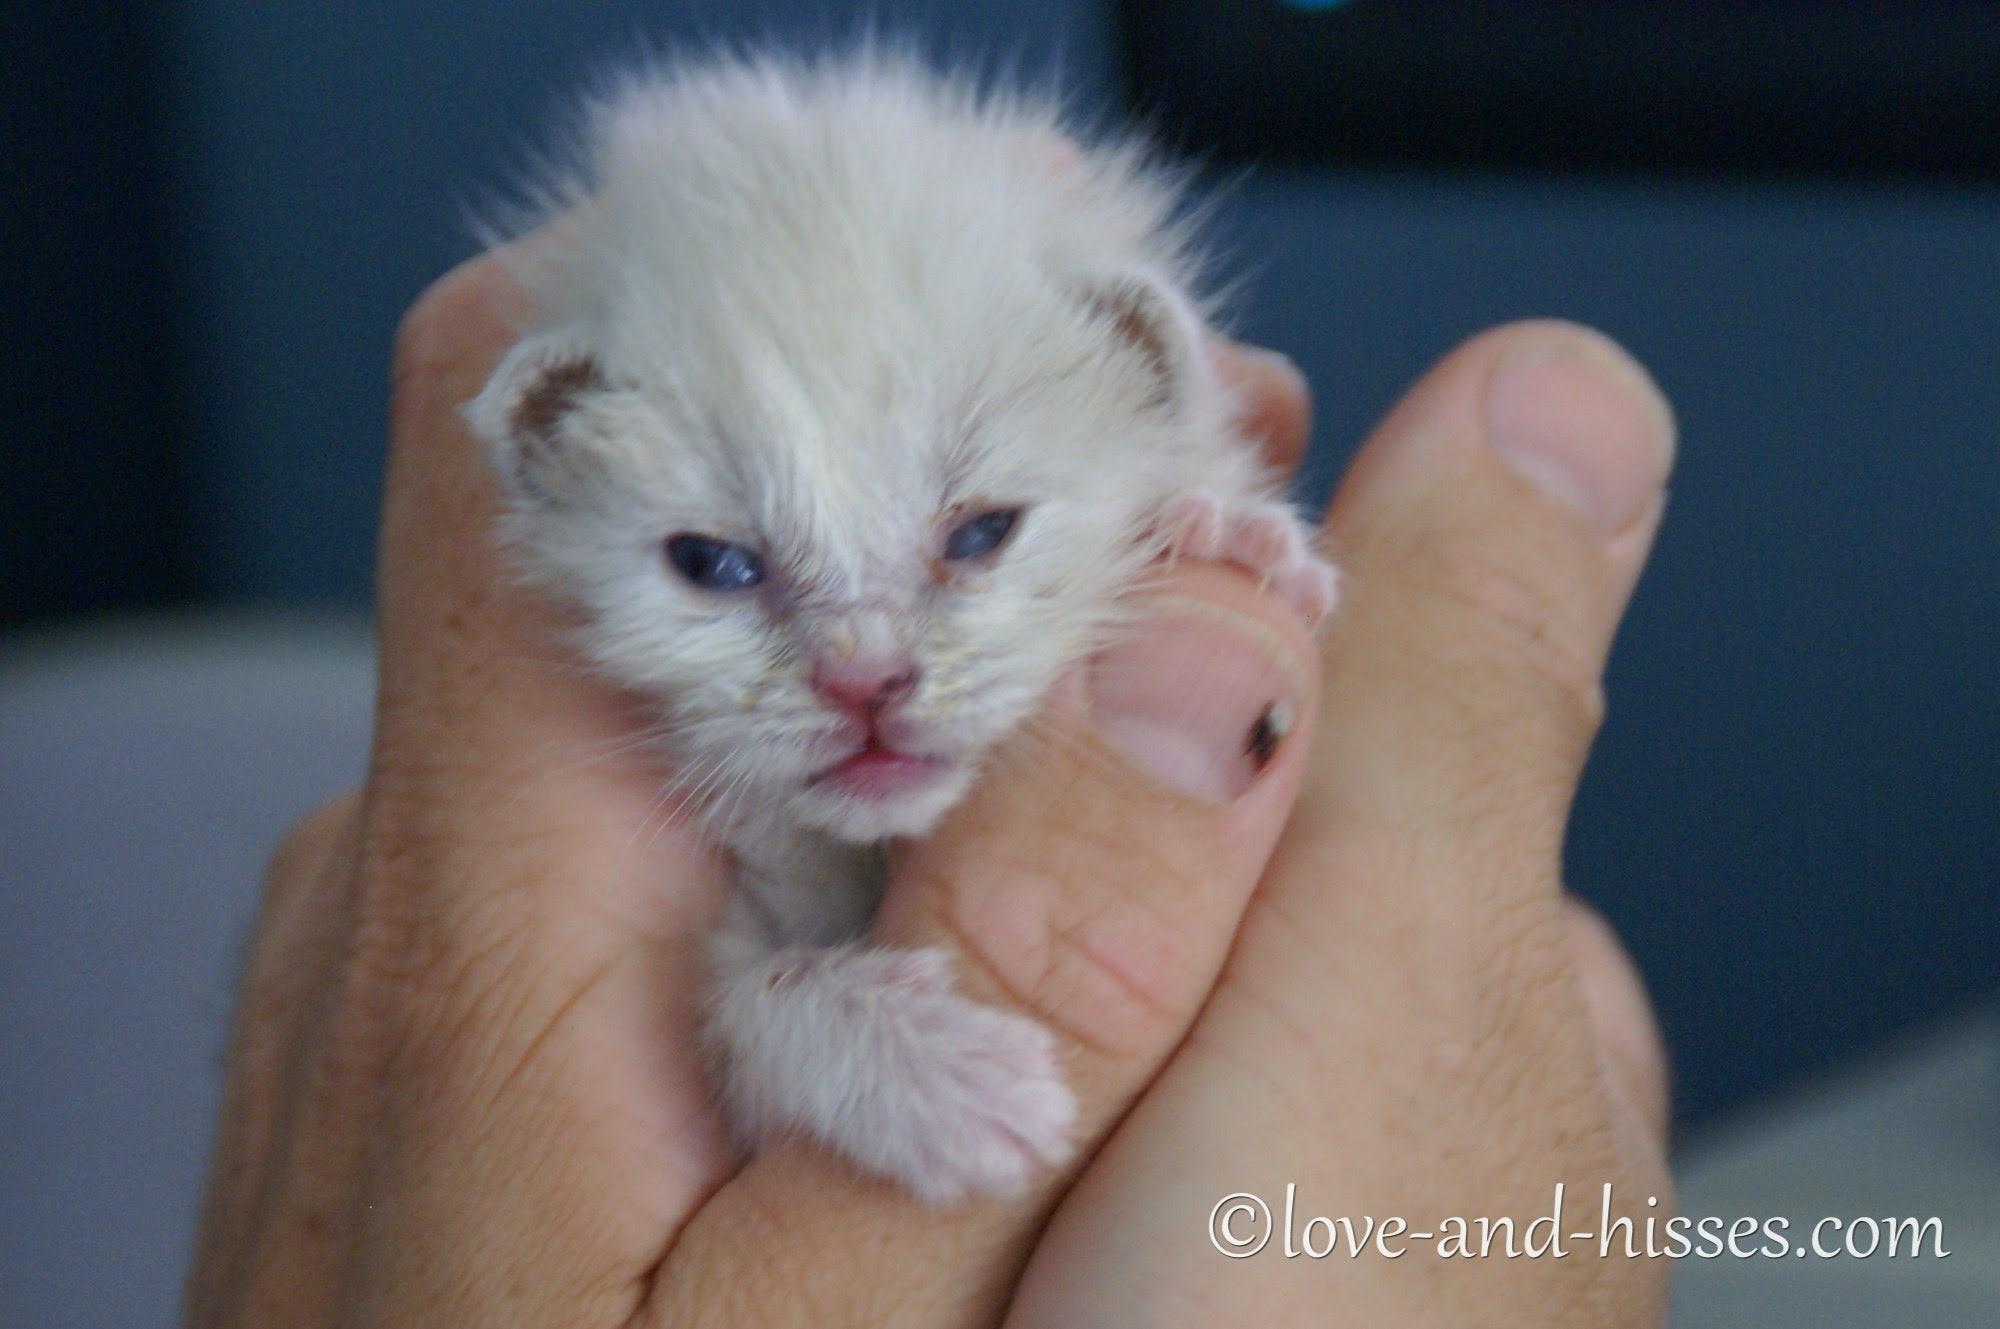 week old white kitten being held in two hands